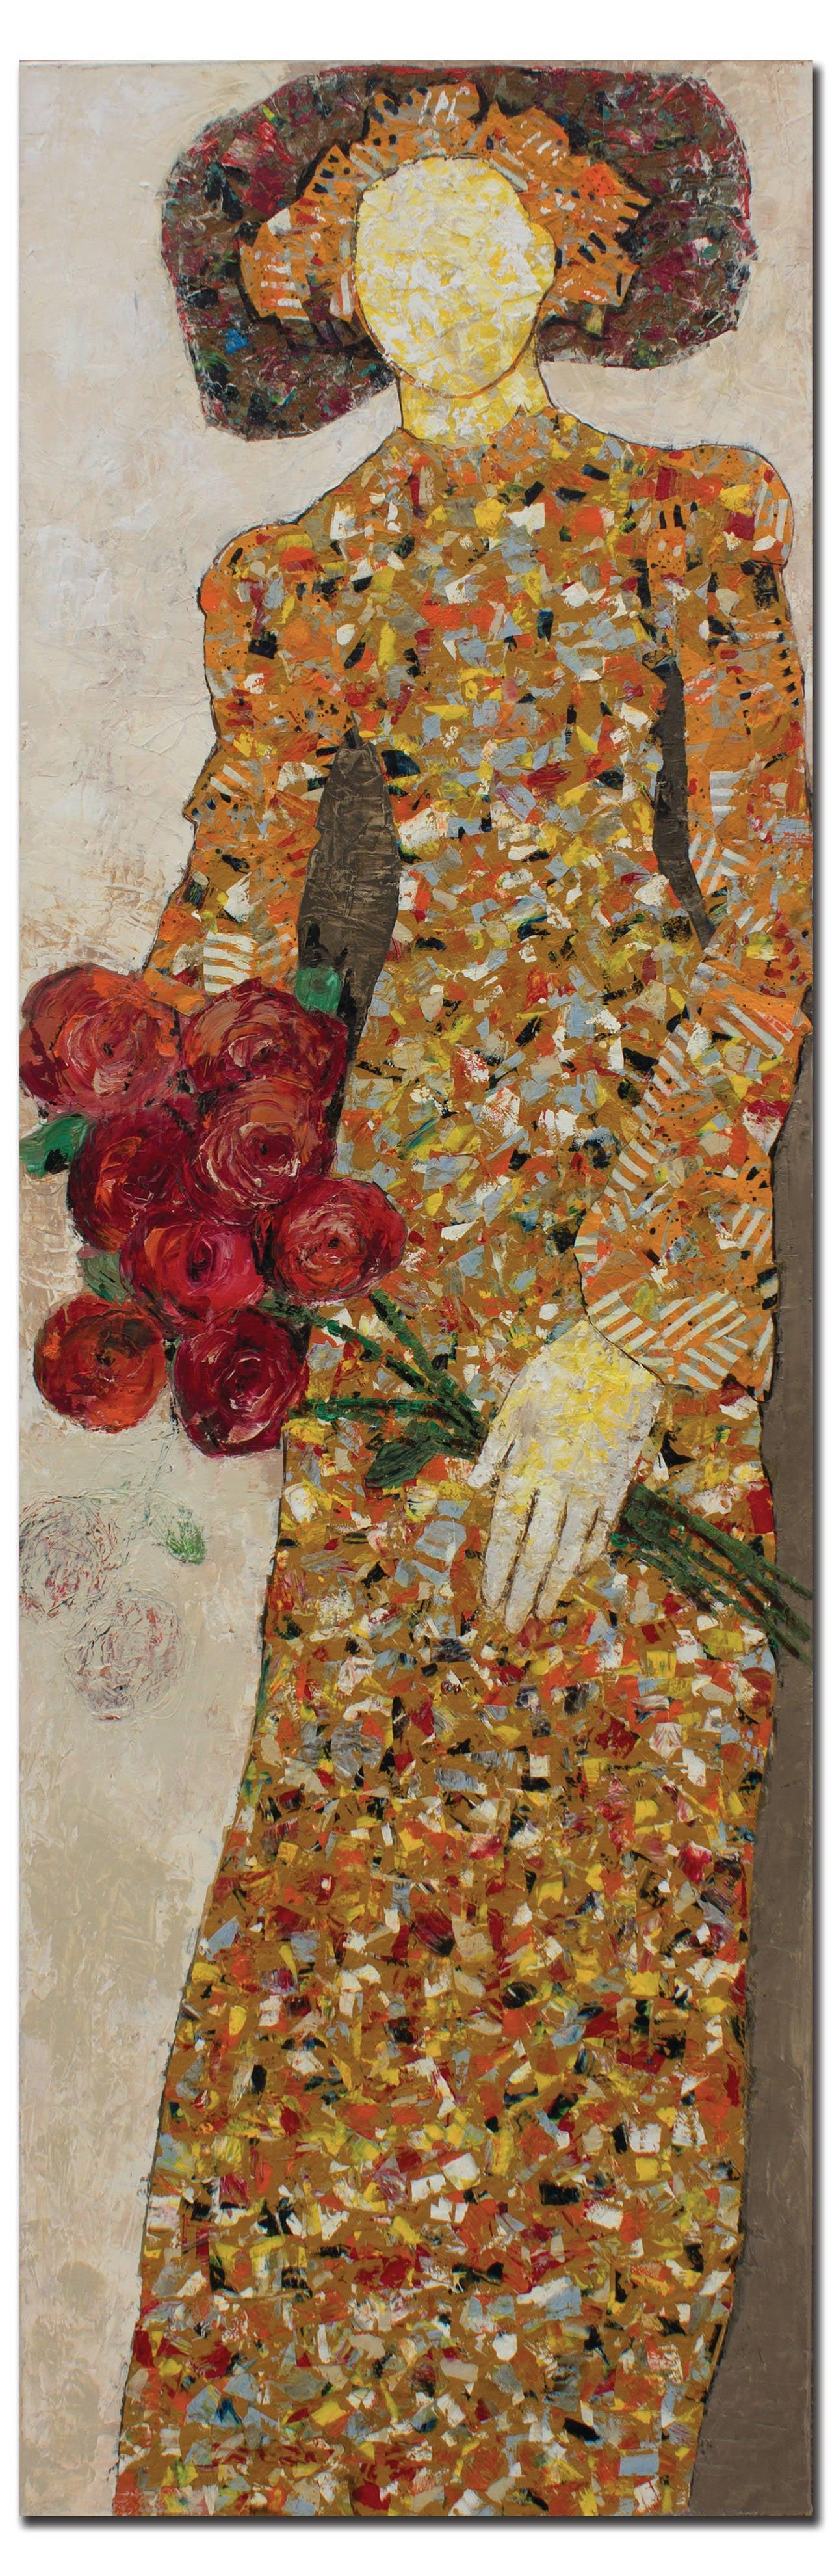 Zivana Gojanovic - Encore, Painting at 1stdibs